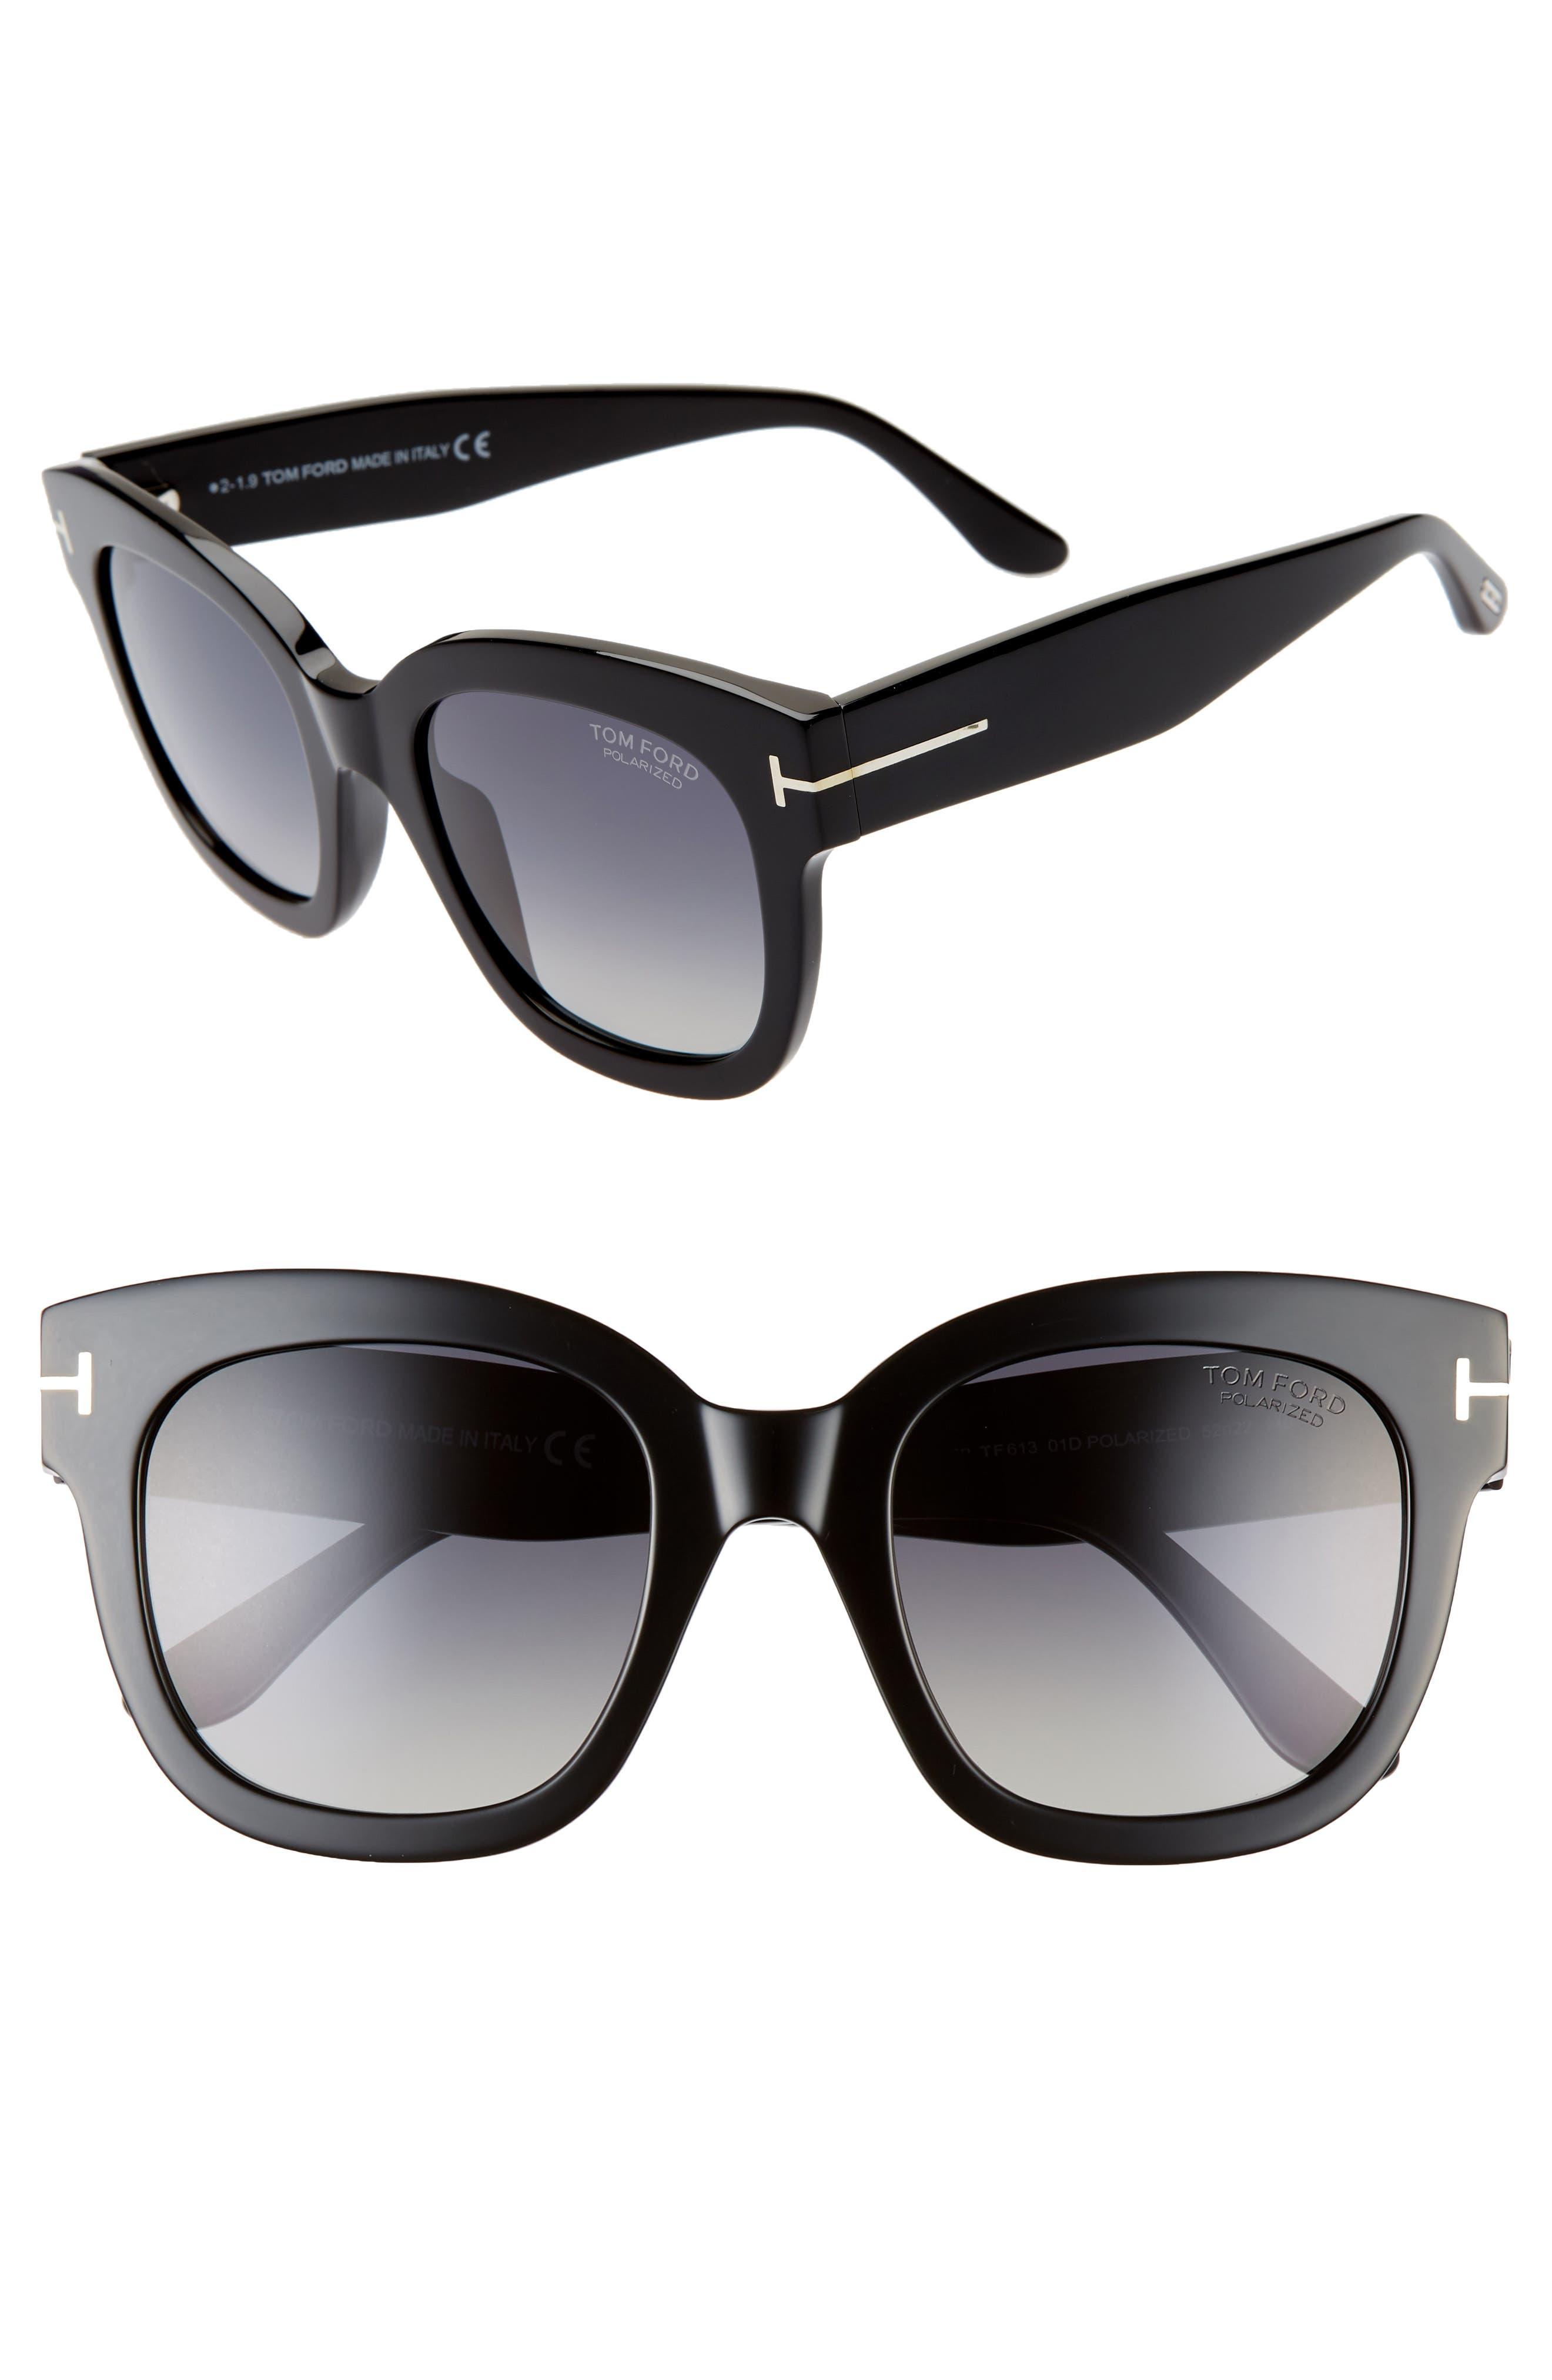 fd76119adb Tom Ford Sunglasses for Women   Men